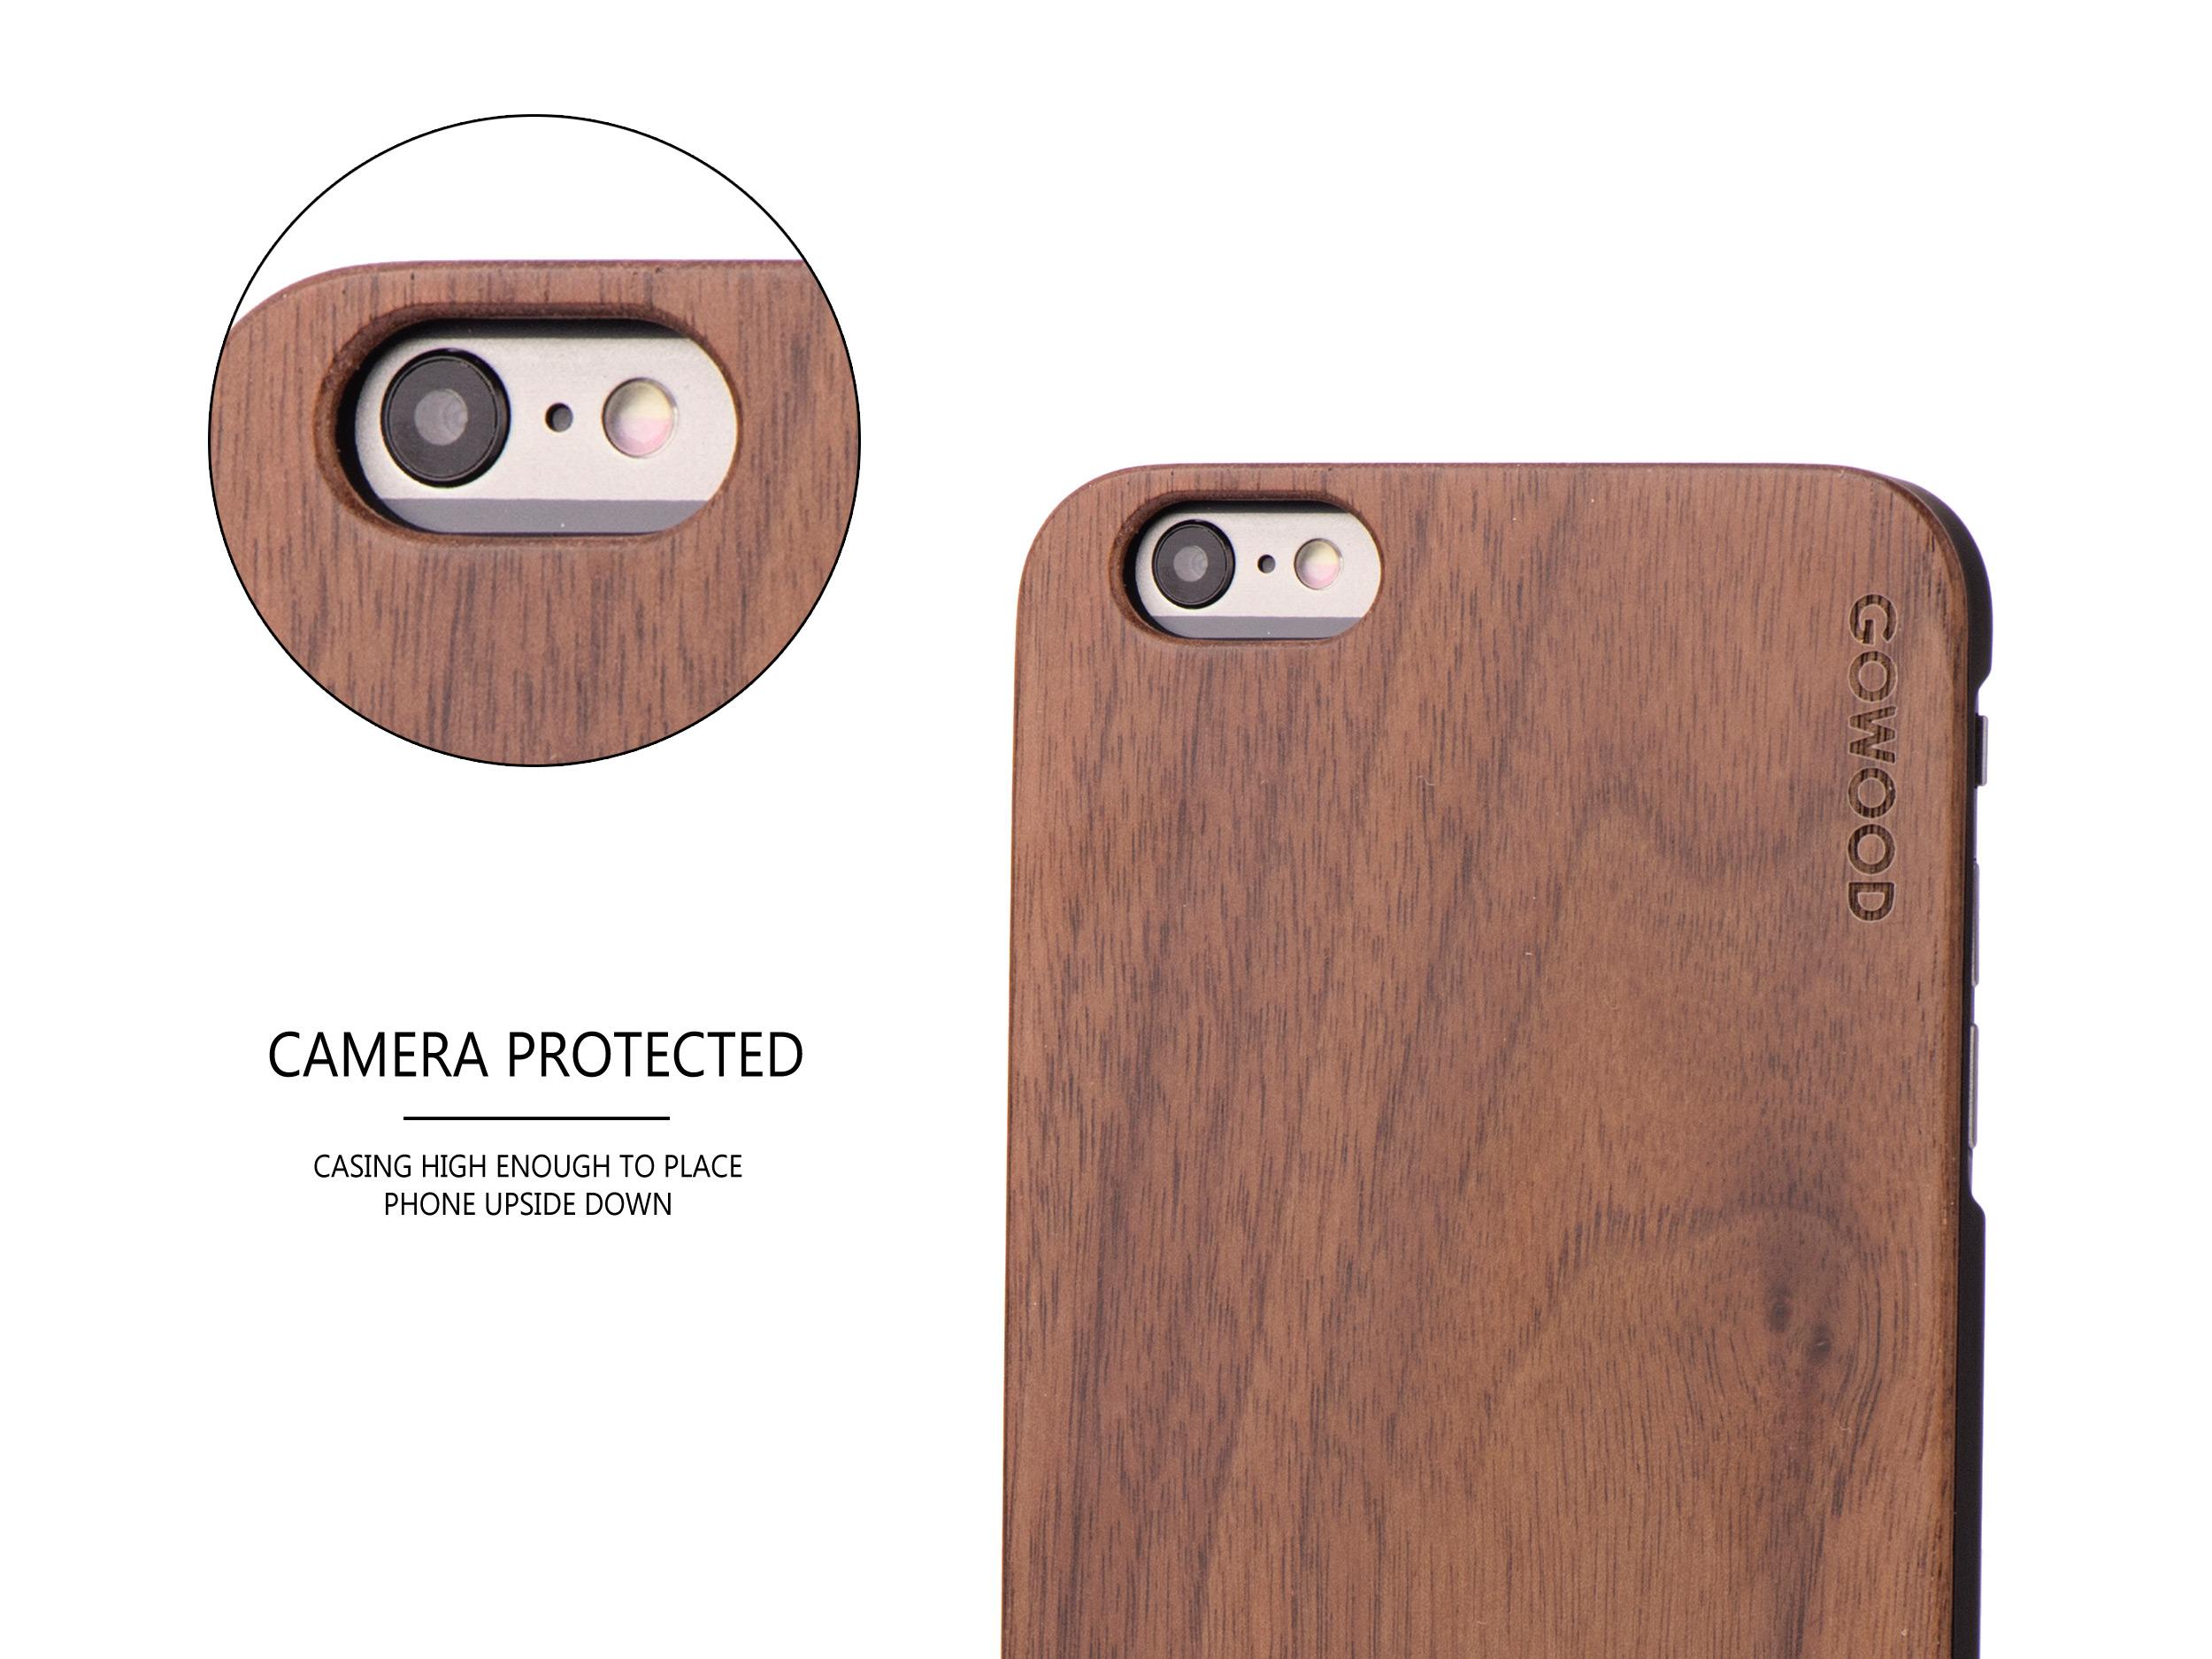 iPhone 6 Plus wood case walnut camera